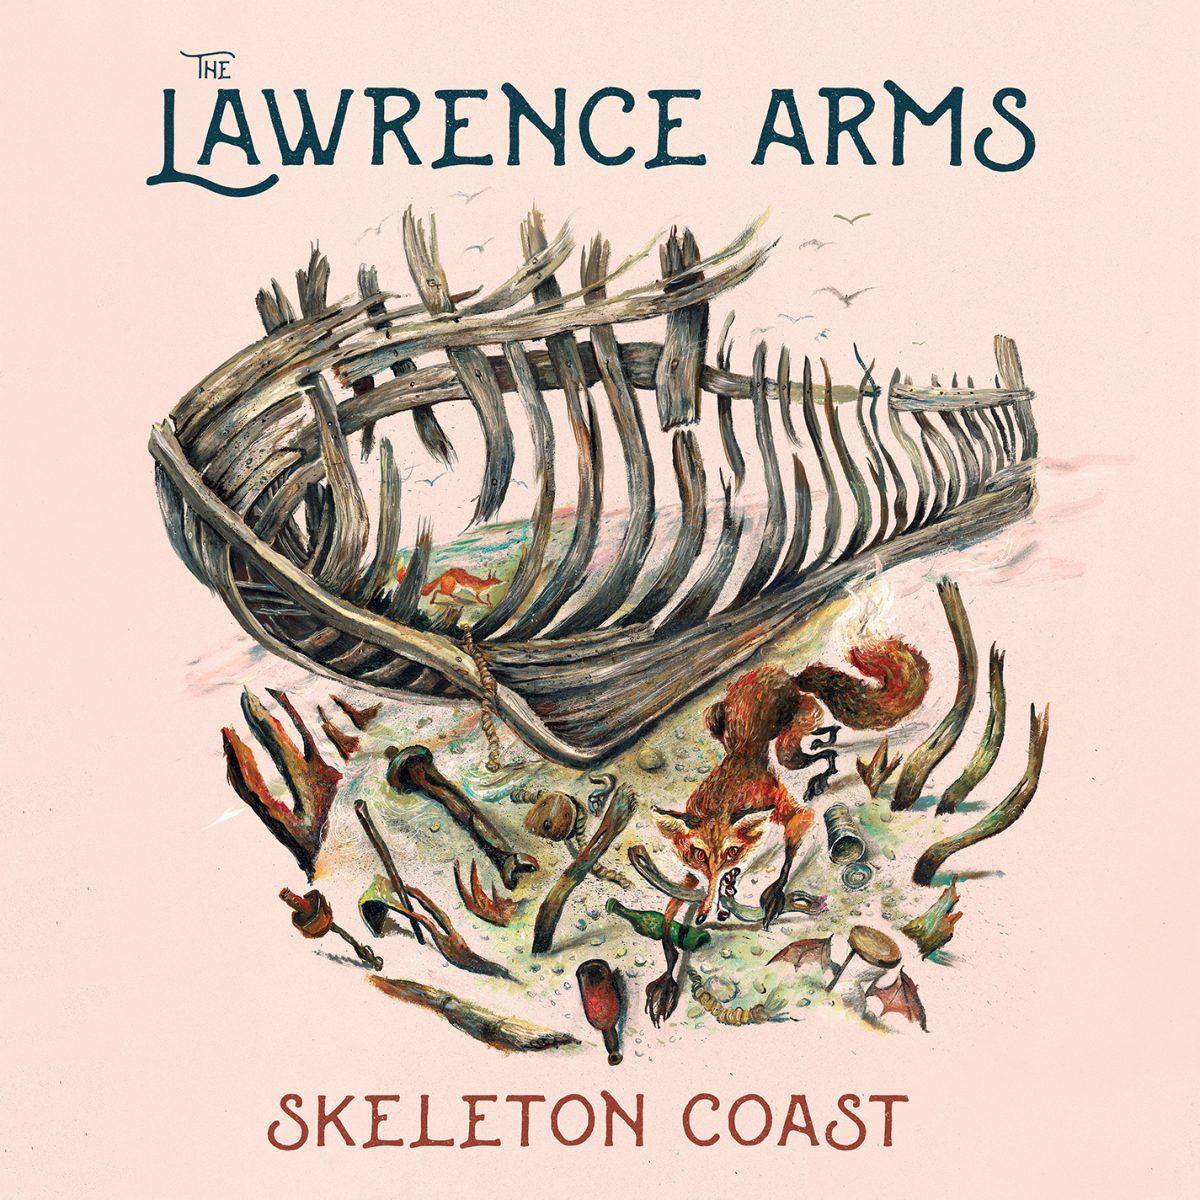 the-lawrence-arms-skeleton-coast-rueckkehr-des-punk-trios-album-review